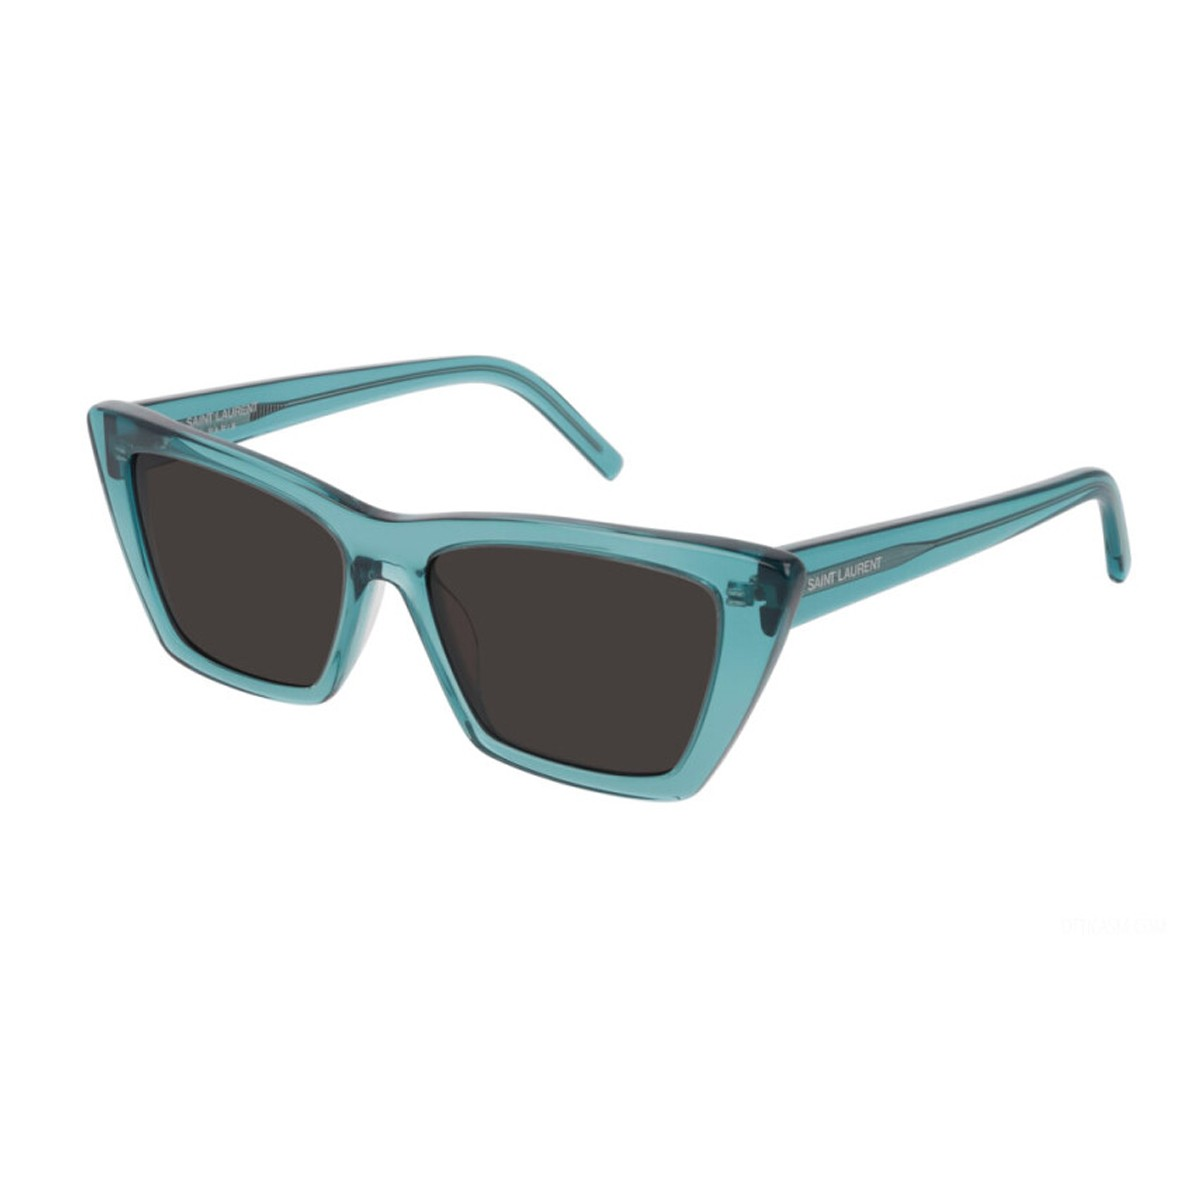 Saint Laurent SL276   Women's sunglasses